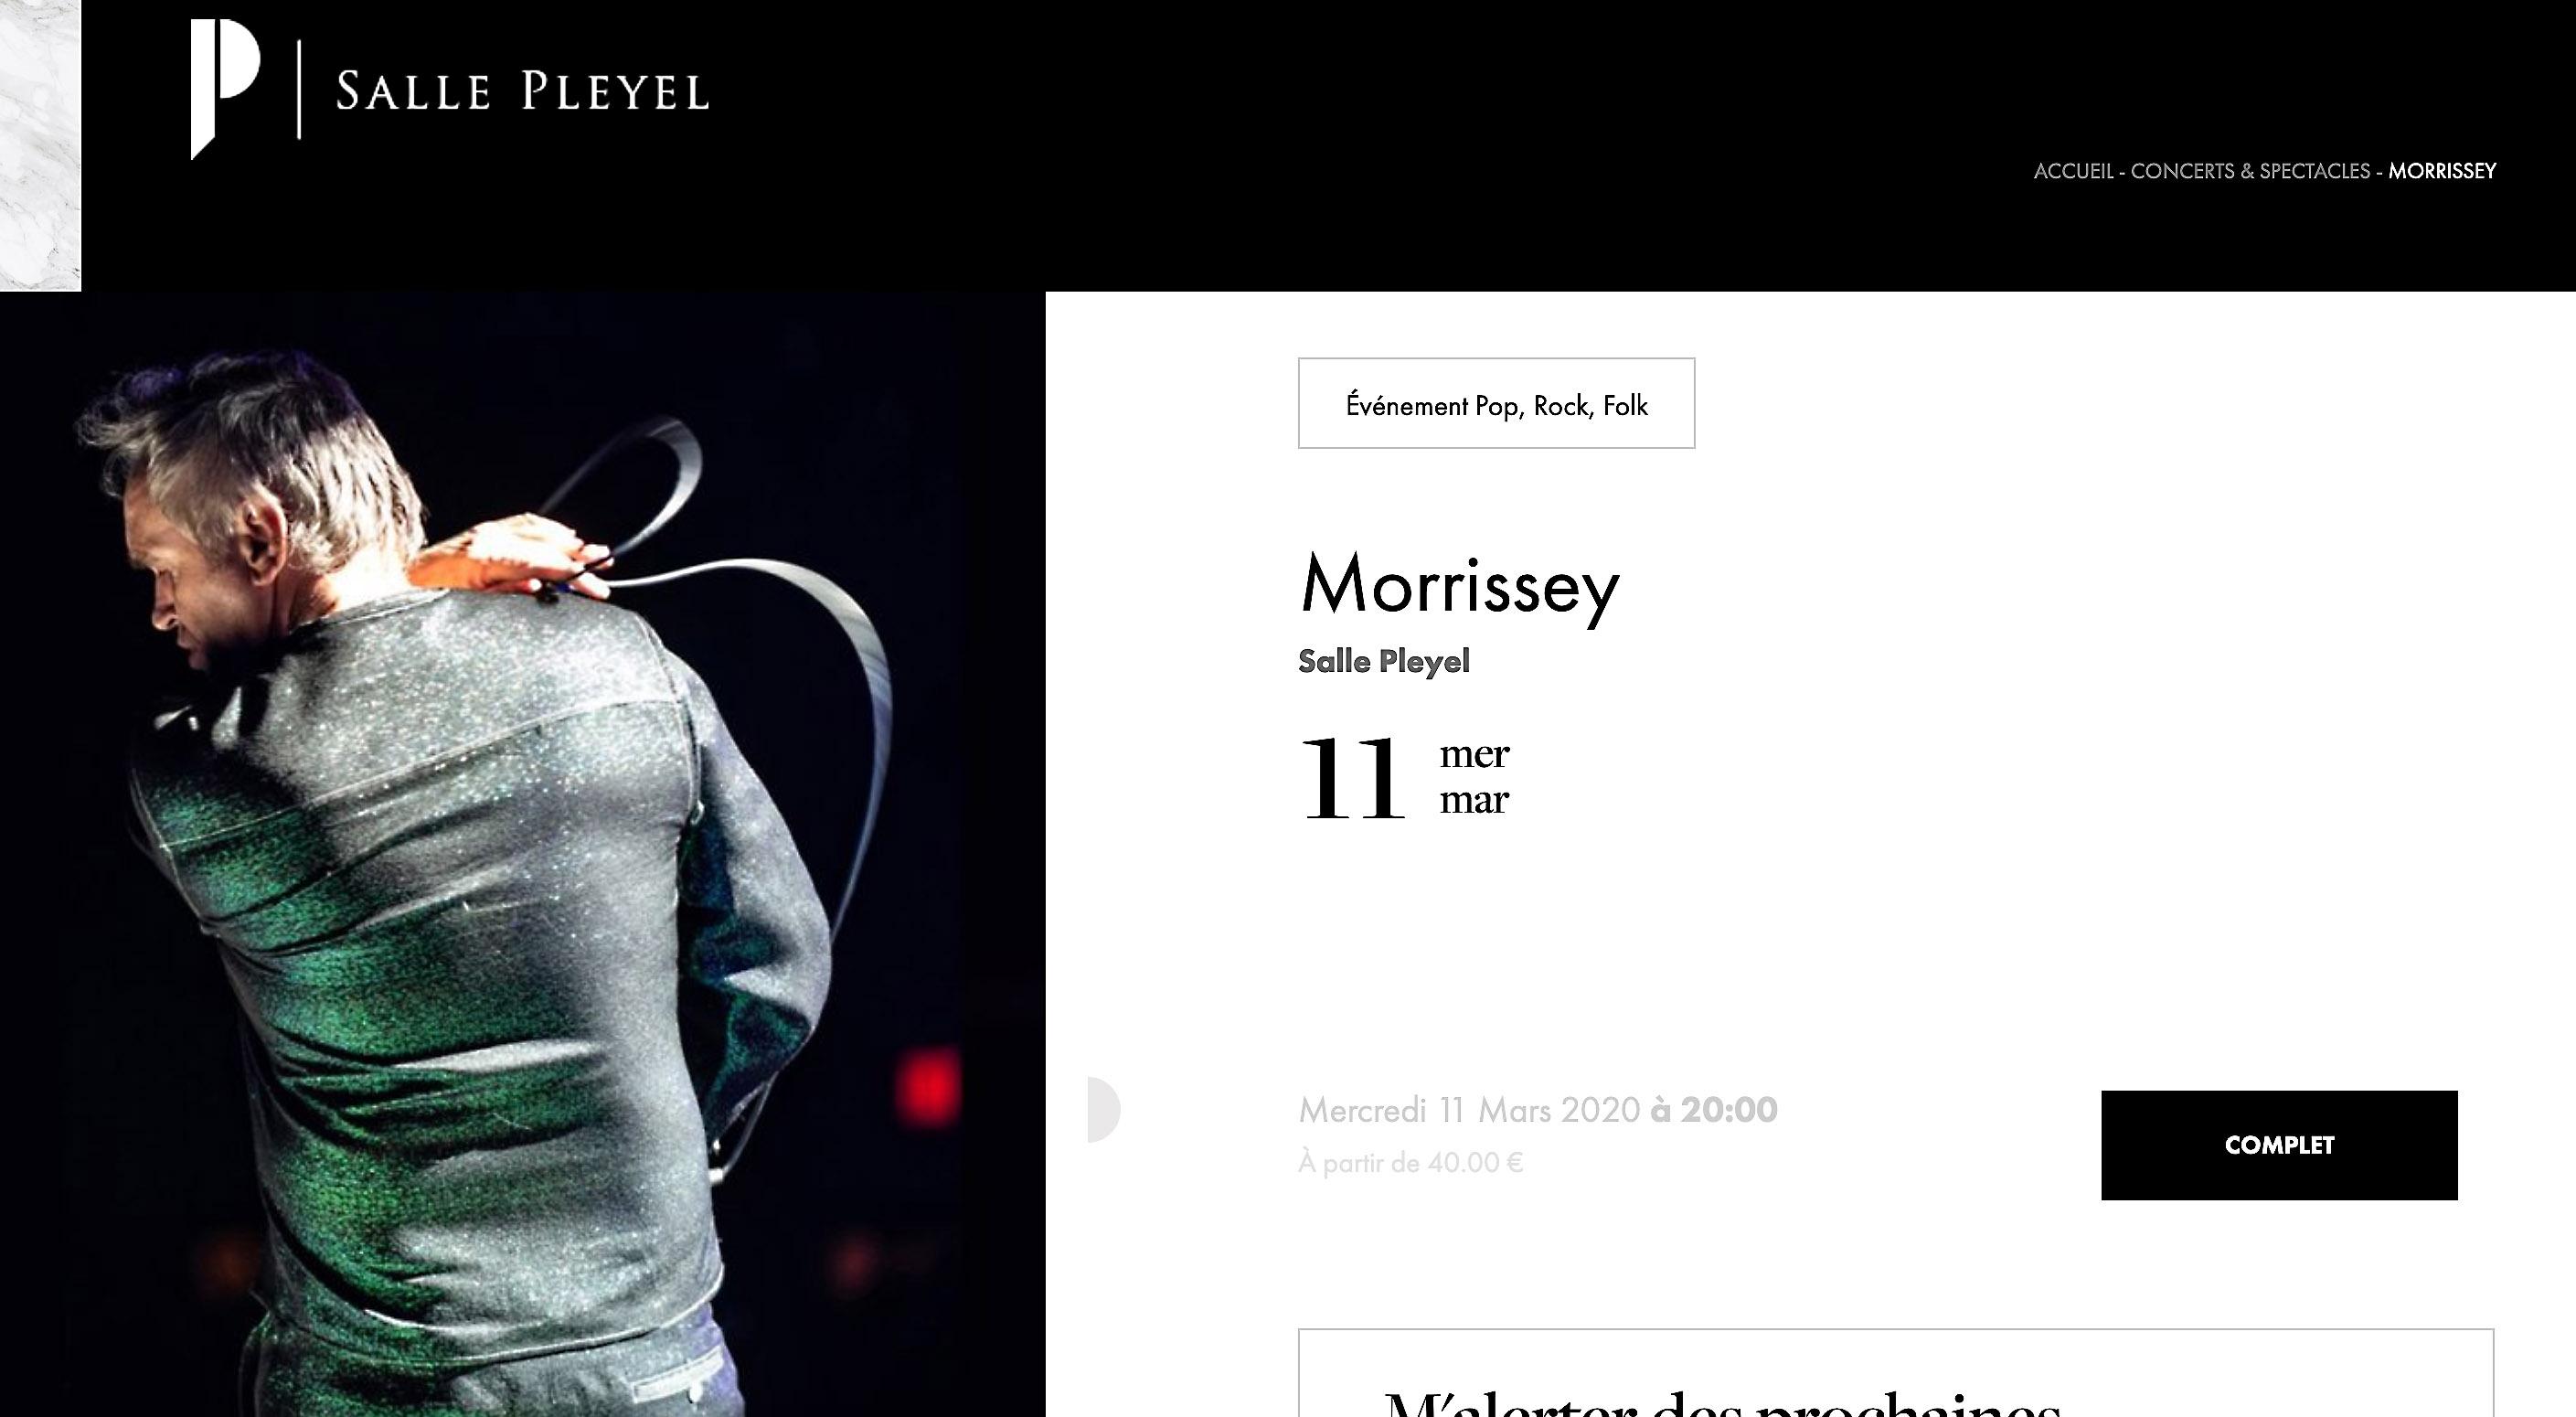 morrissey pleyel.jpg